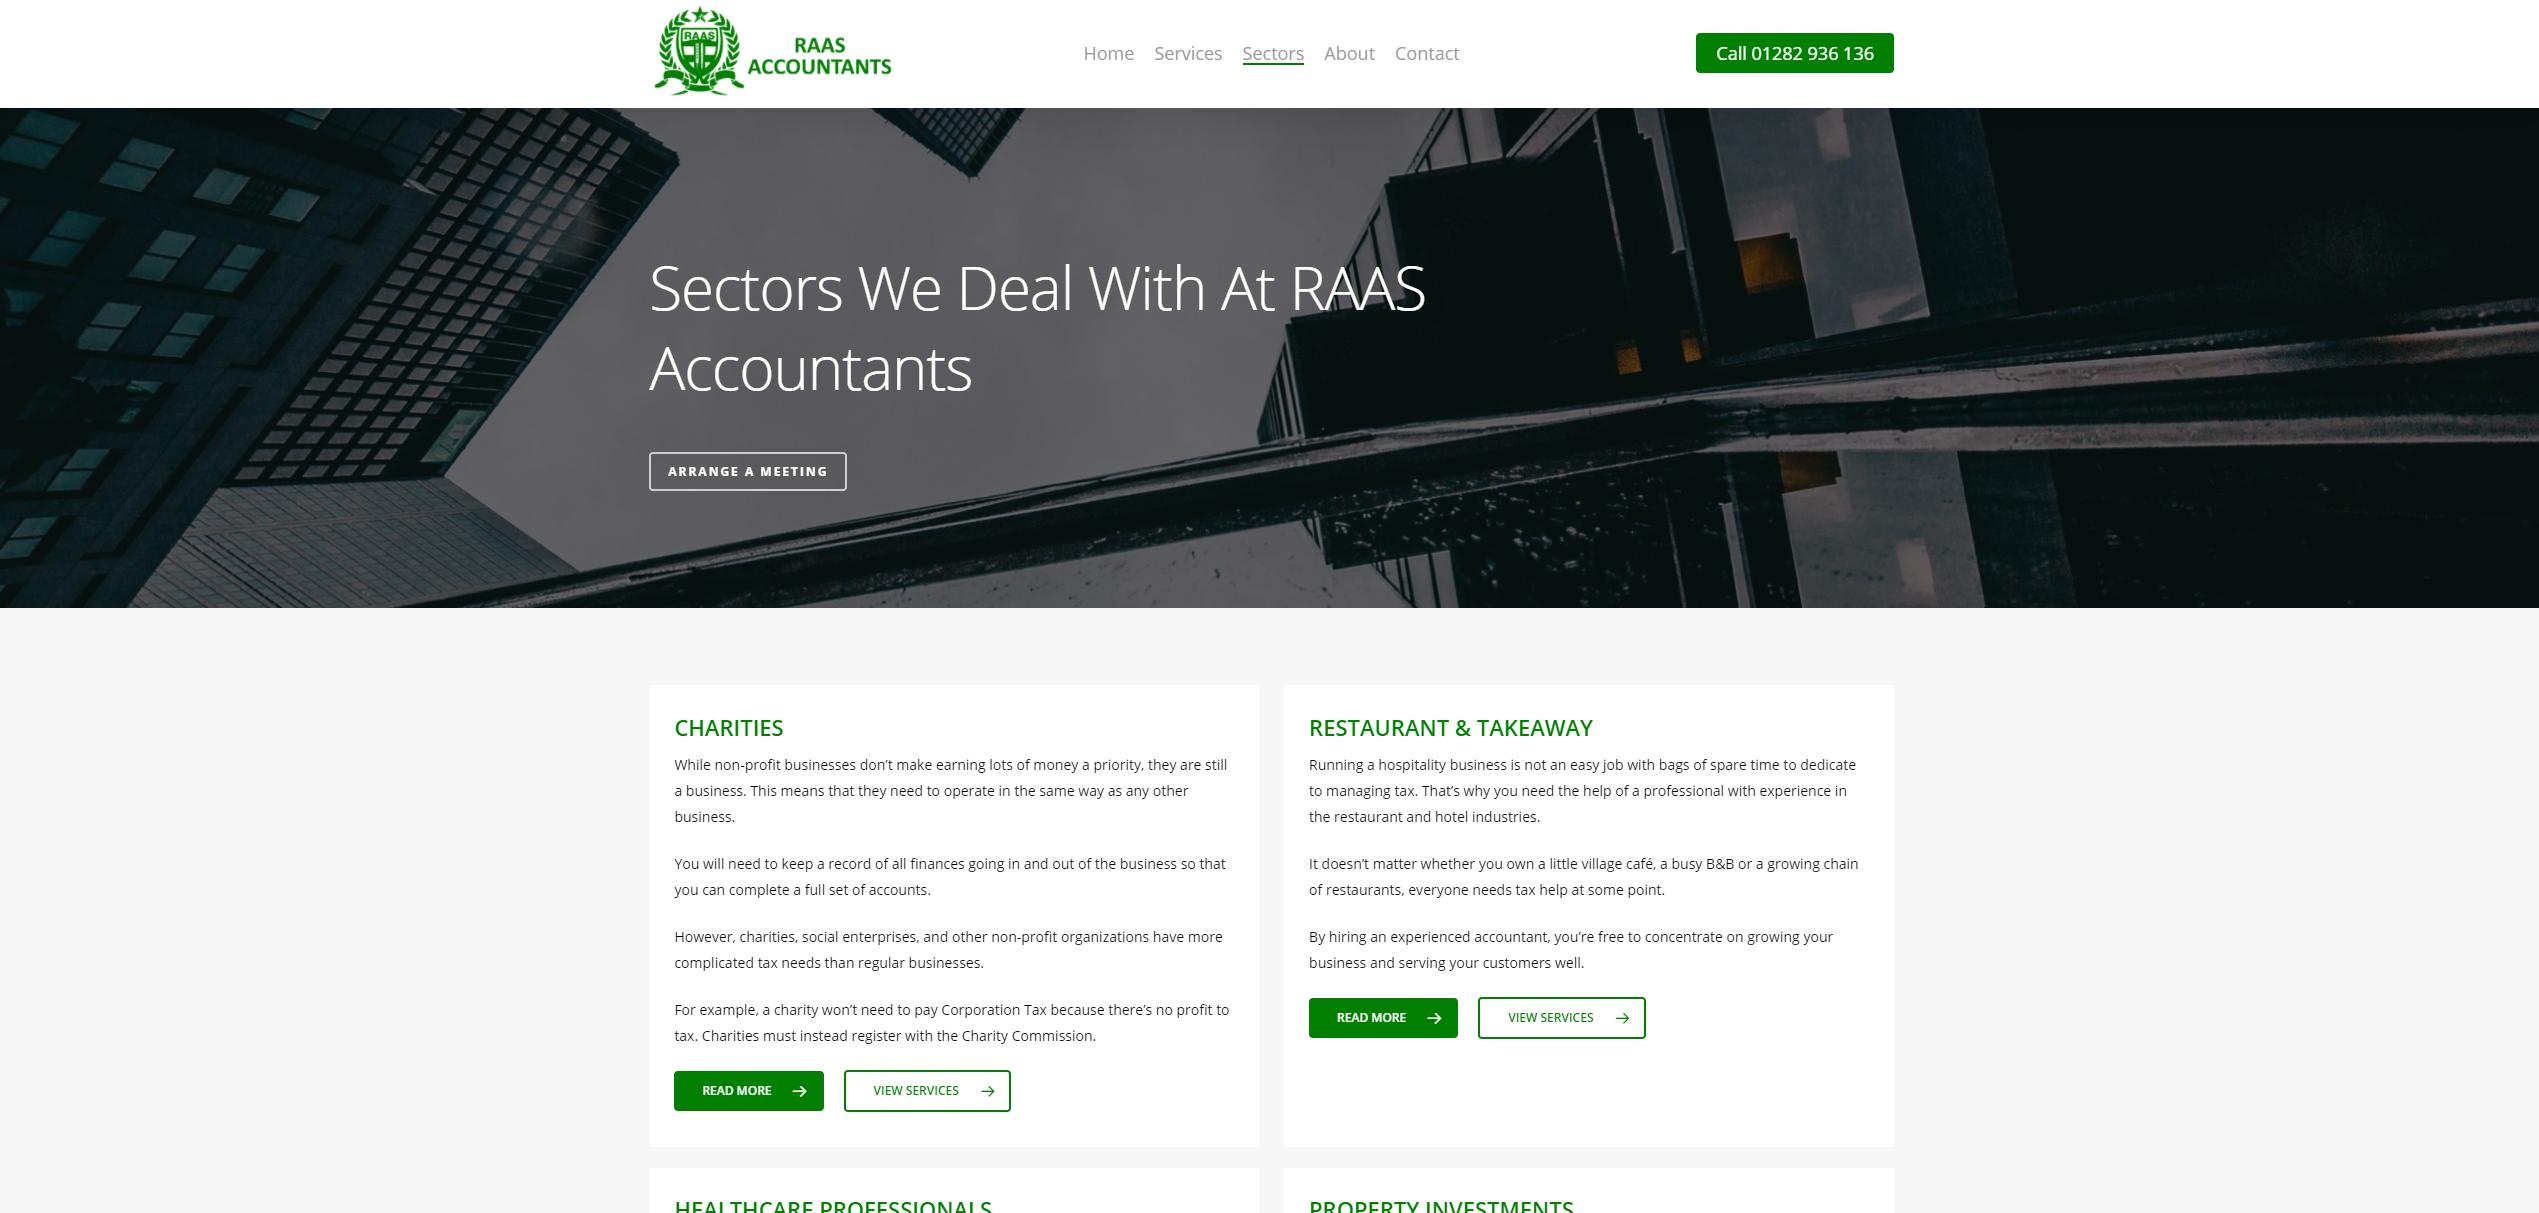 RAAS Accountants